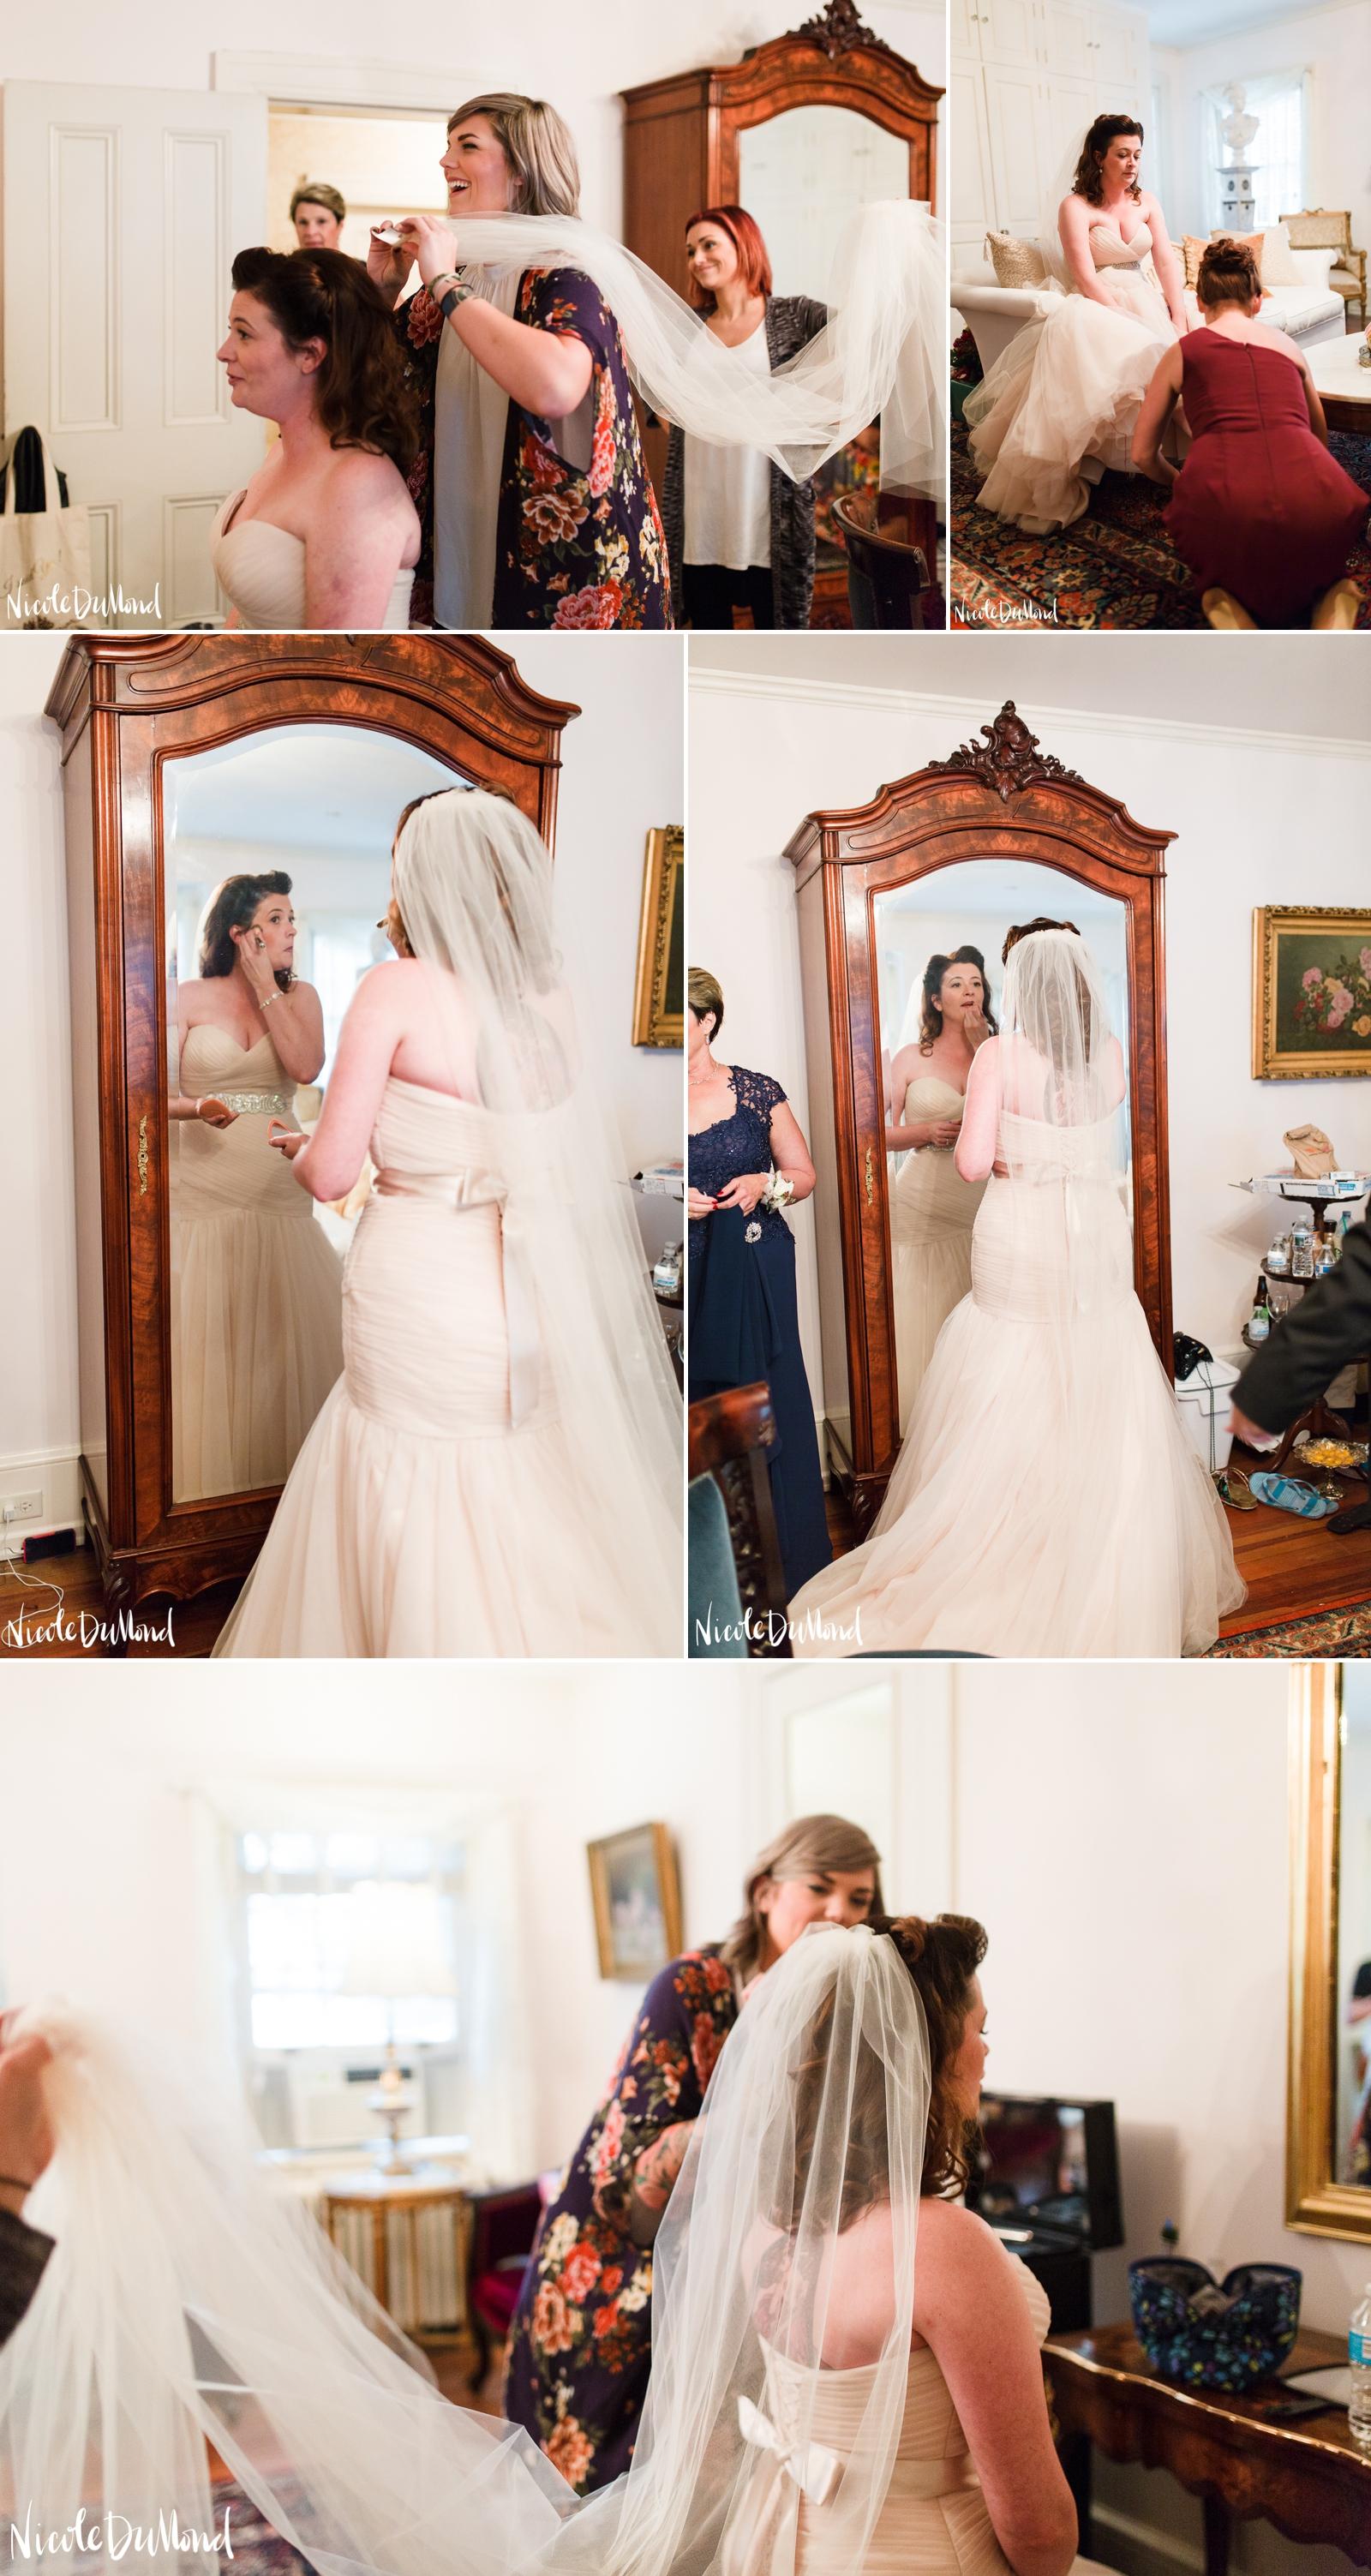 bush-house-wedding 27